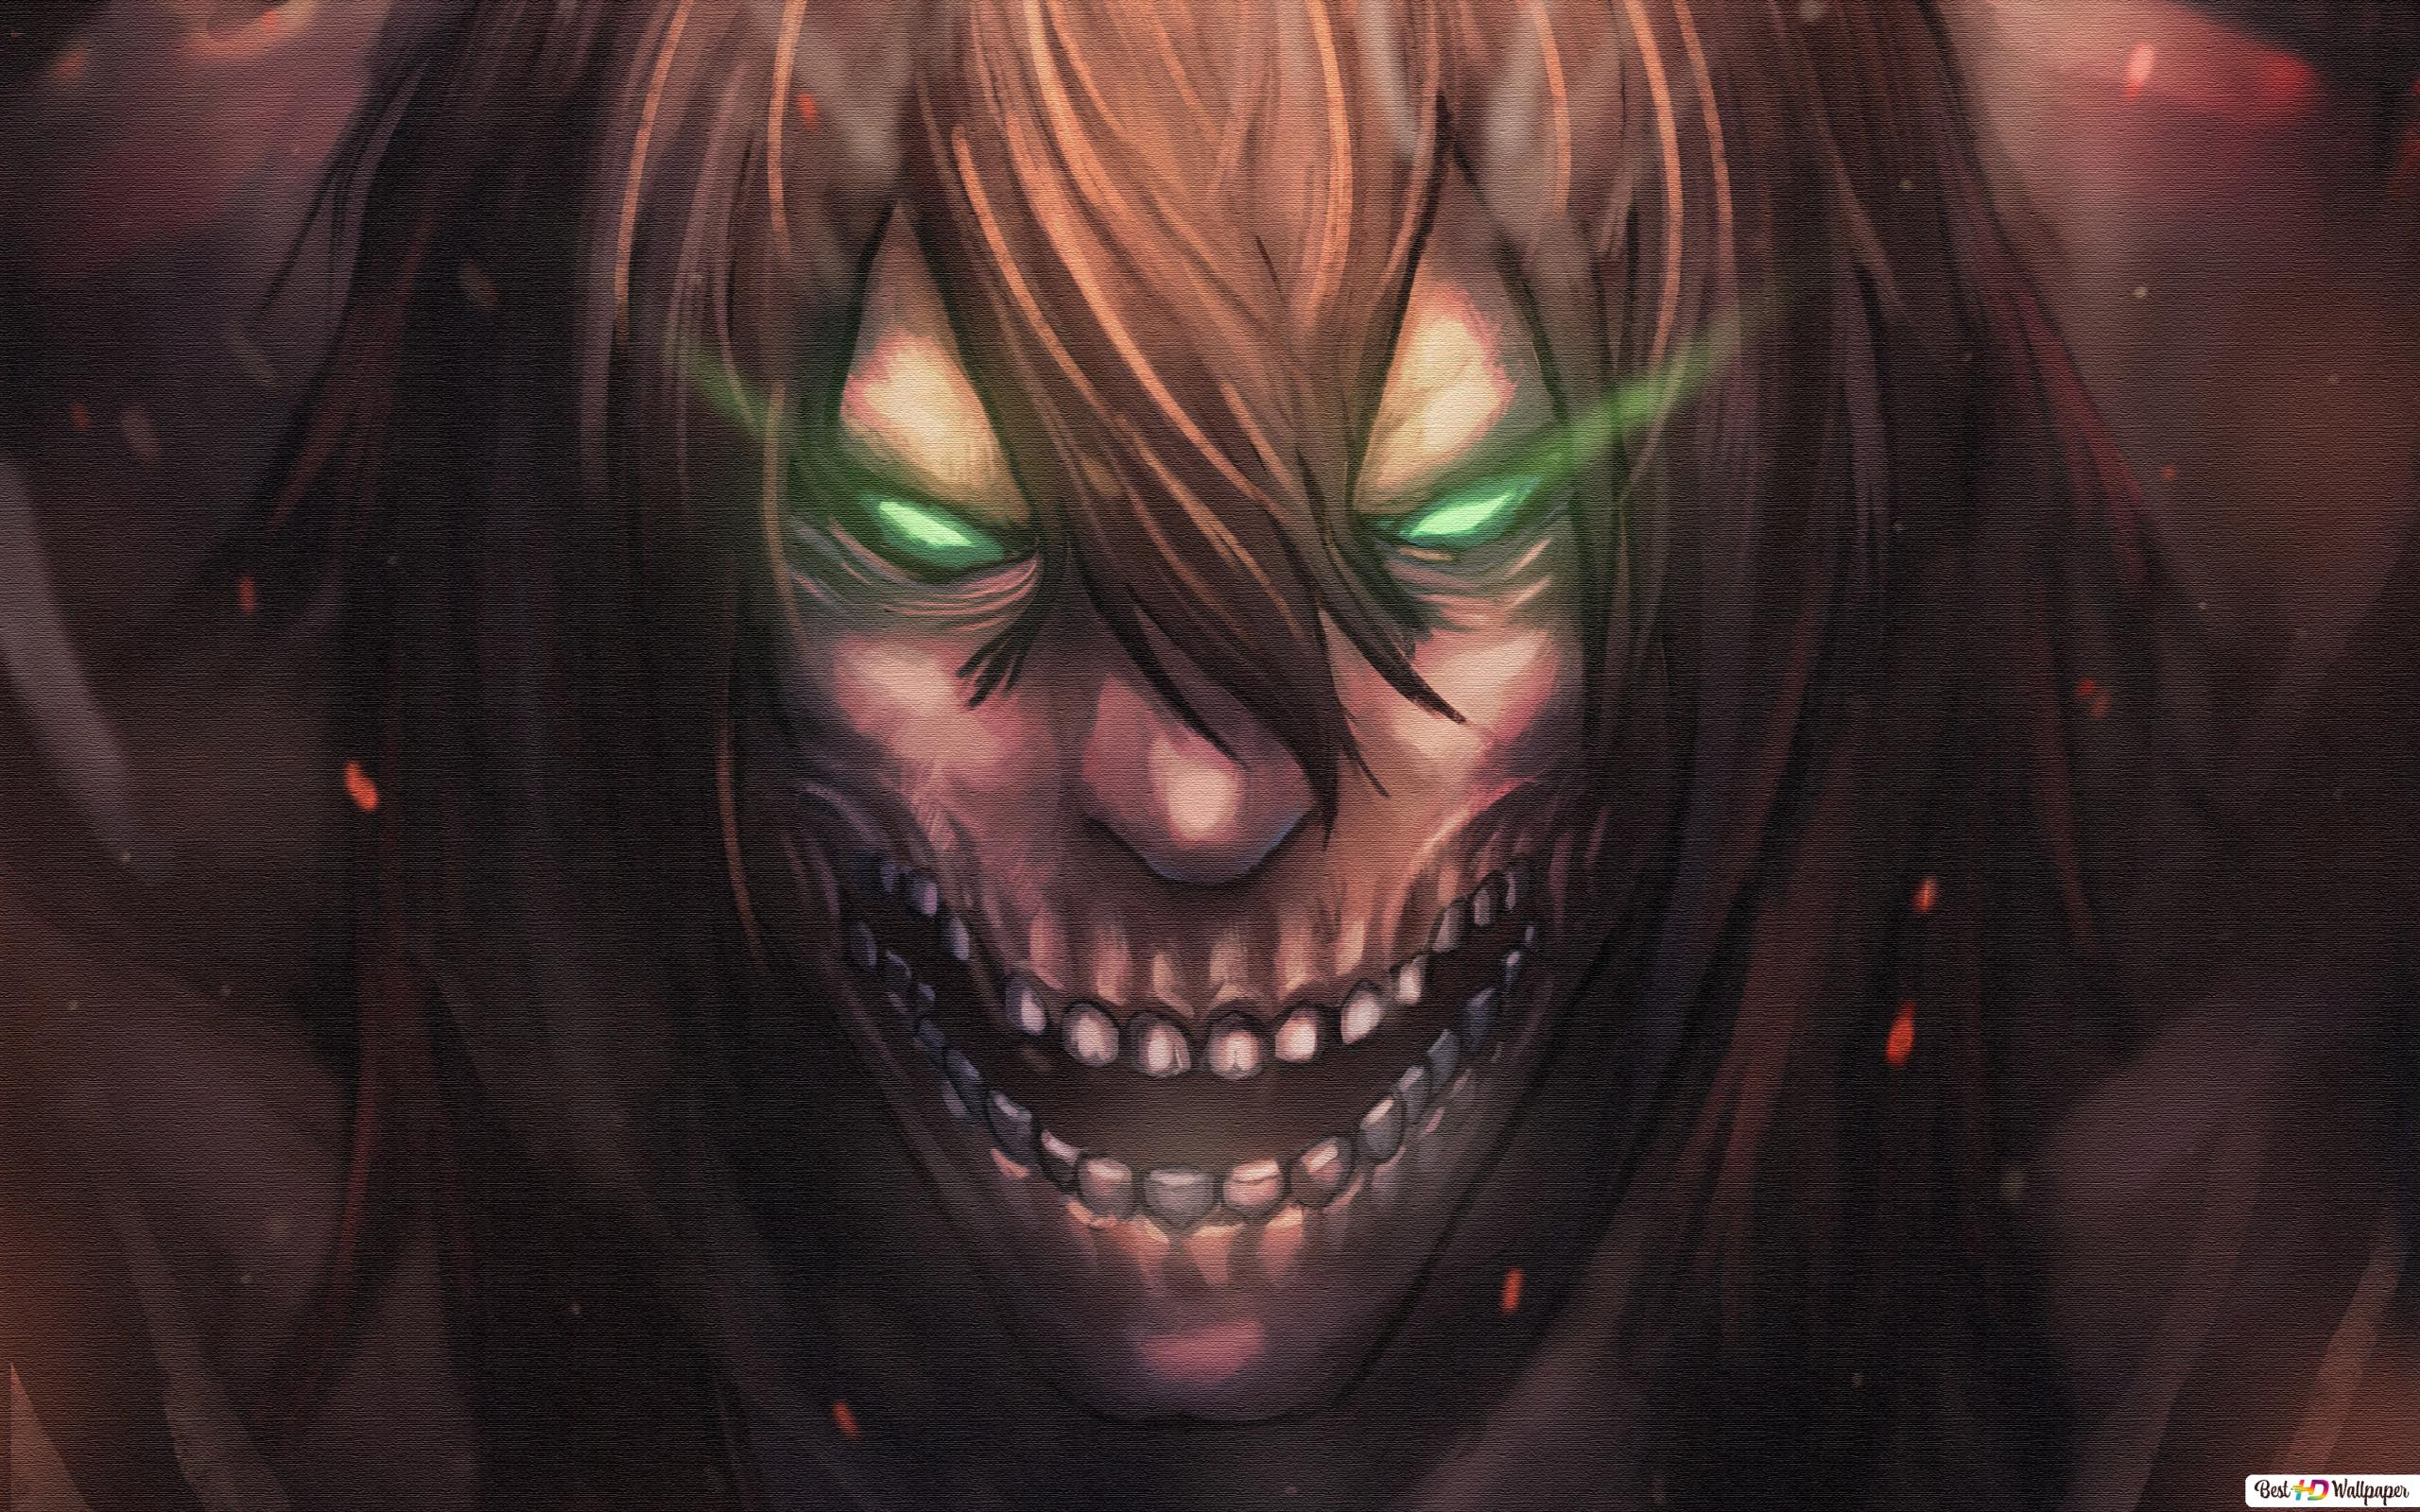 Attack Titan Hd Wallpaper Download